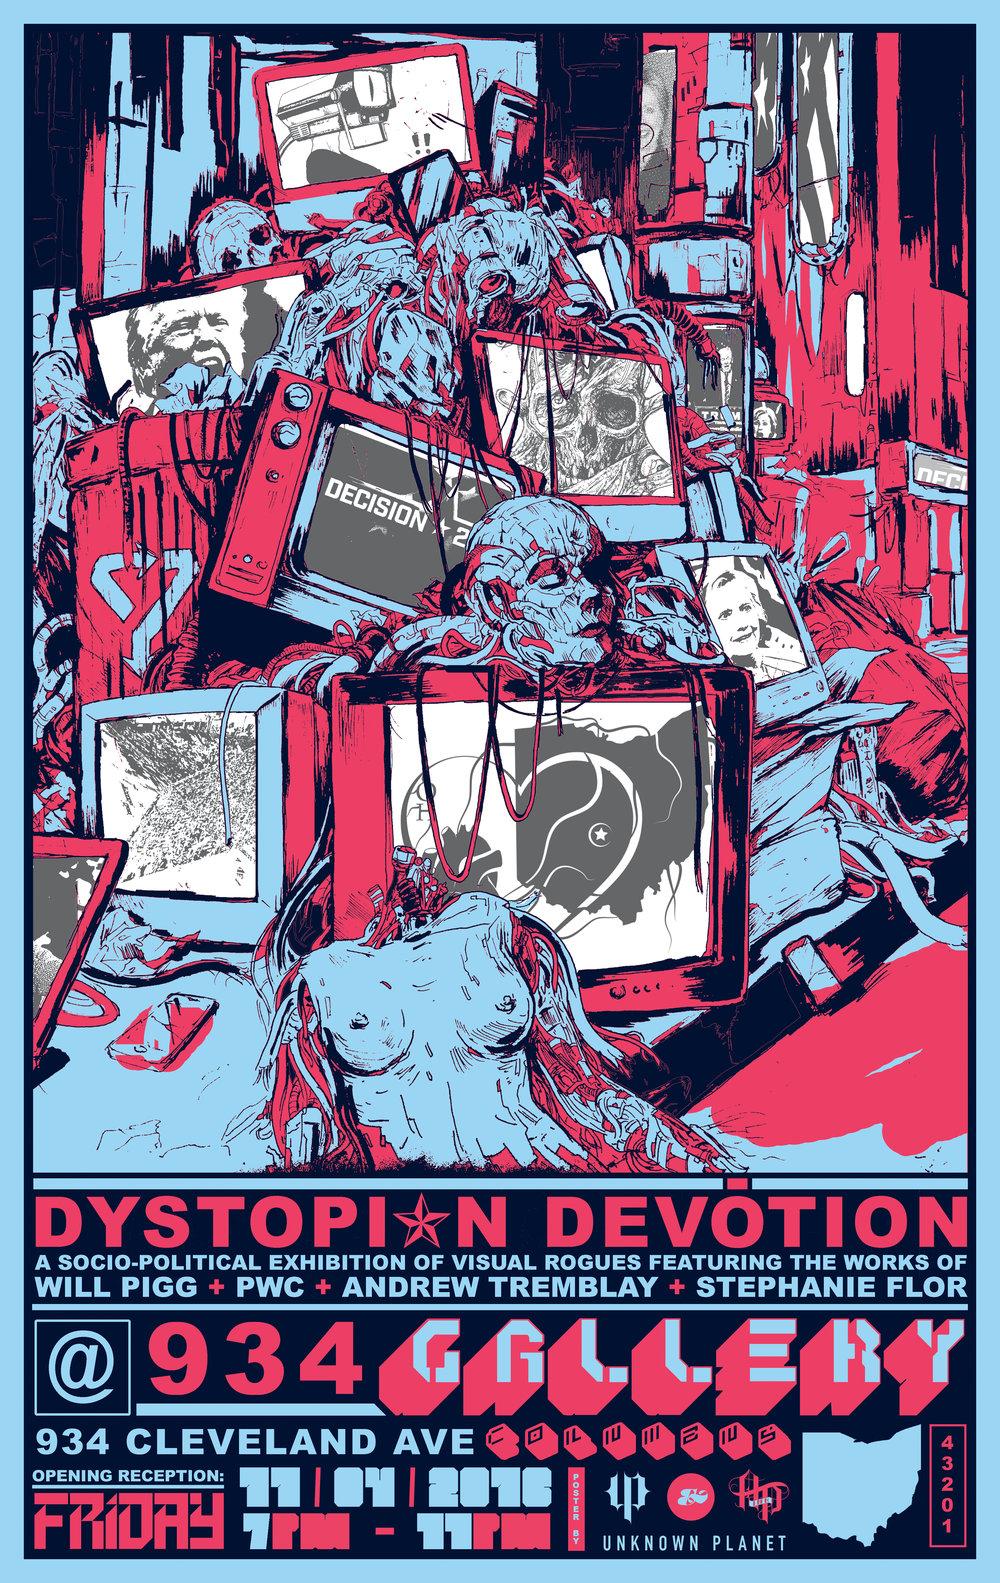 DYSTOPIAN DEVOTION Poster rgb .jpg